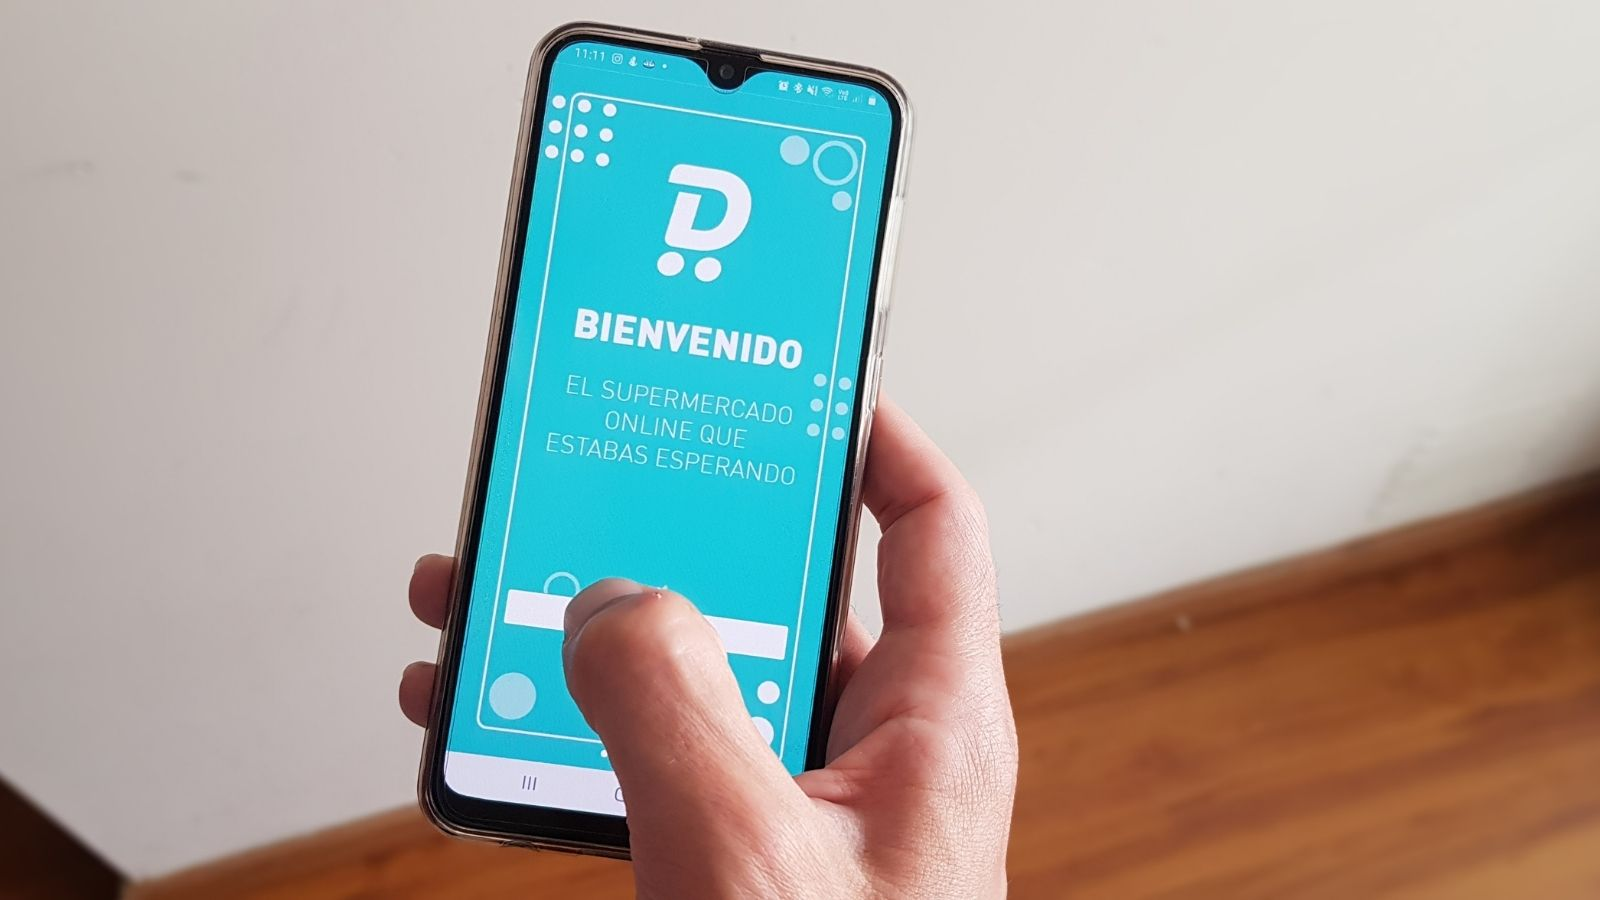 Traen a Funes un supermercado virtual para comprar desde el celular